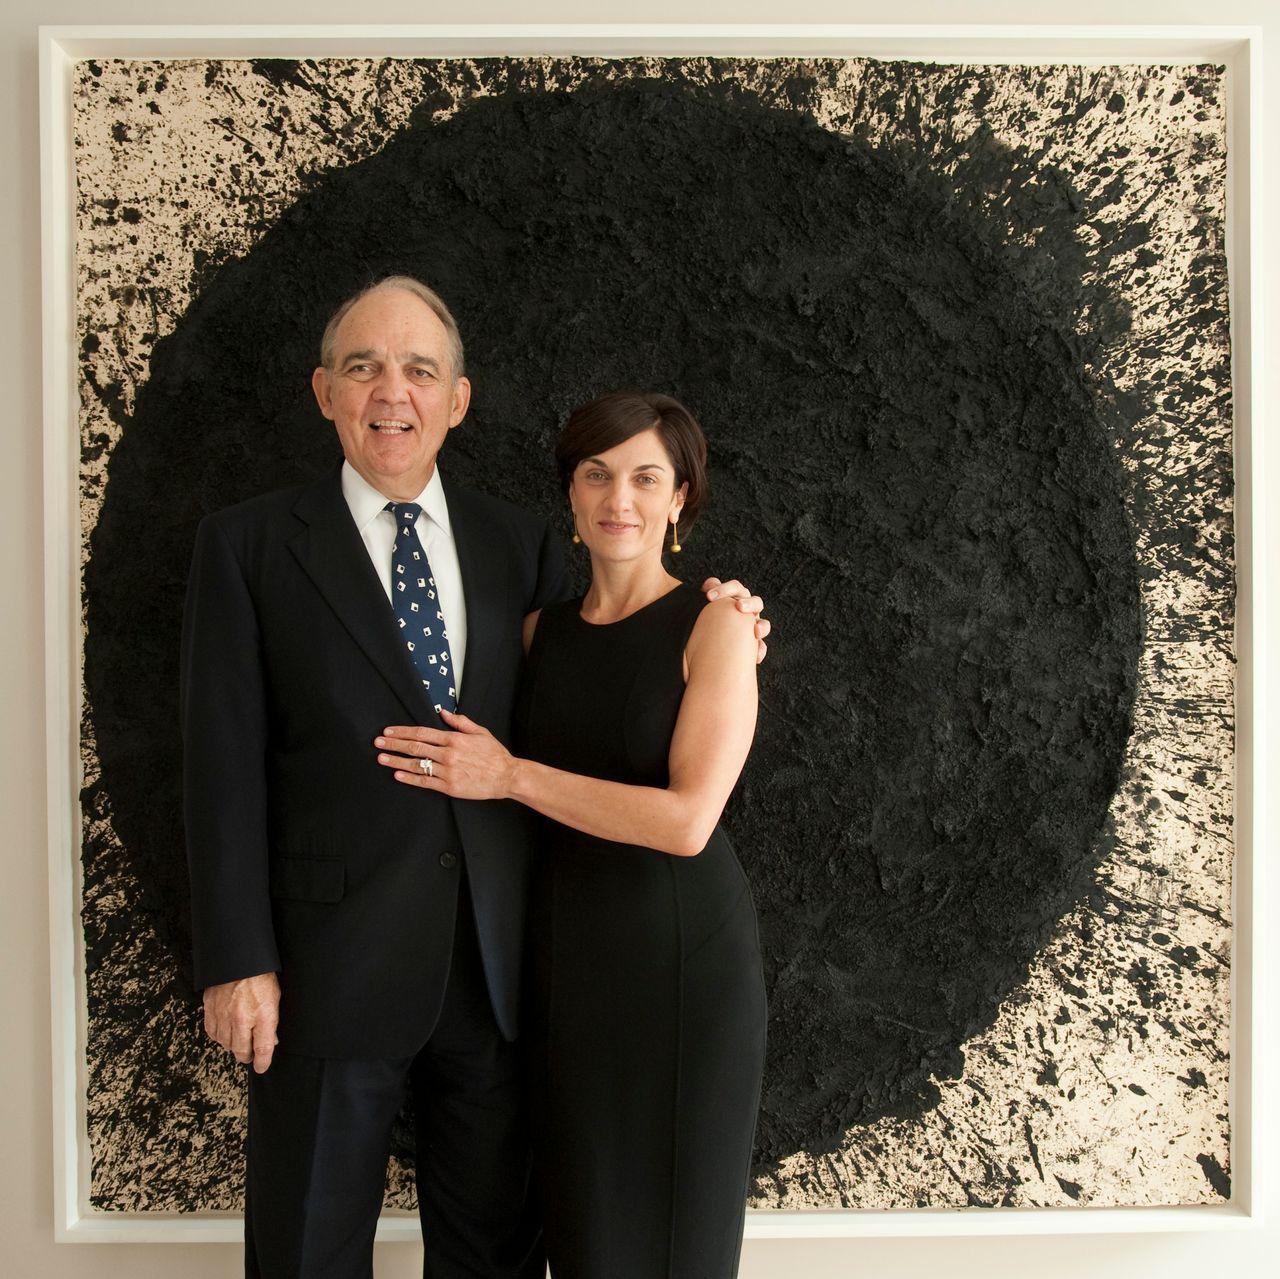 Donald L. Bryant Jr and Bettina Sulser